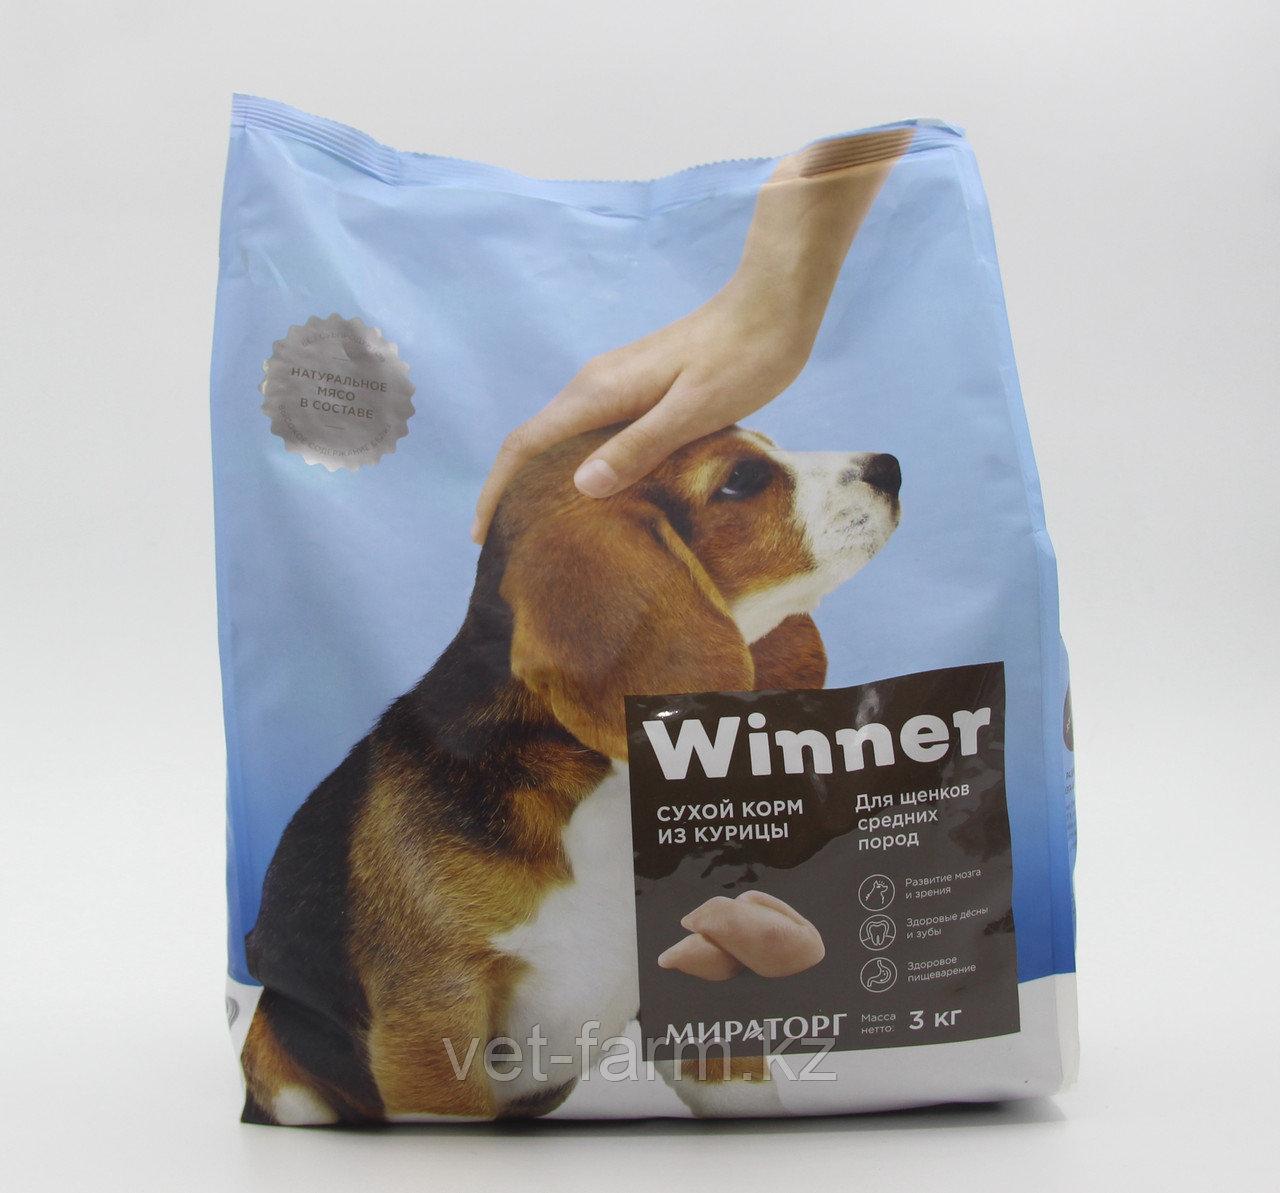 Сухой корм для щенков средних пород  Winner 1 кг из курицы